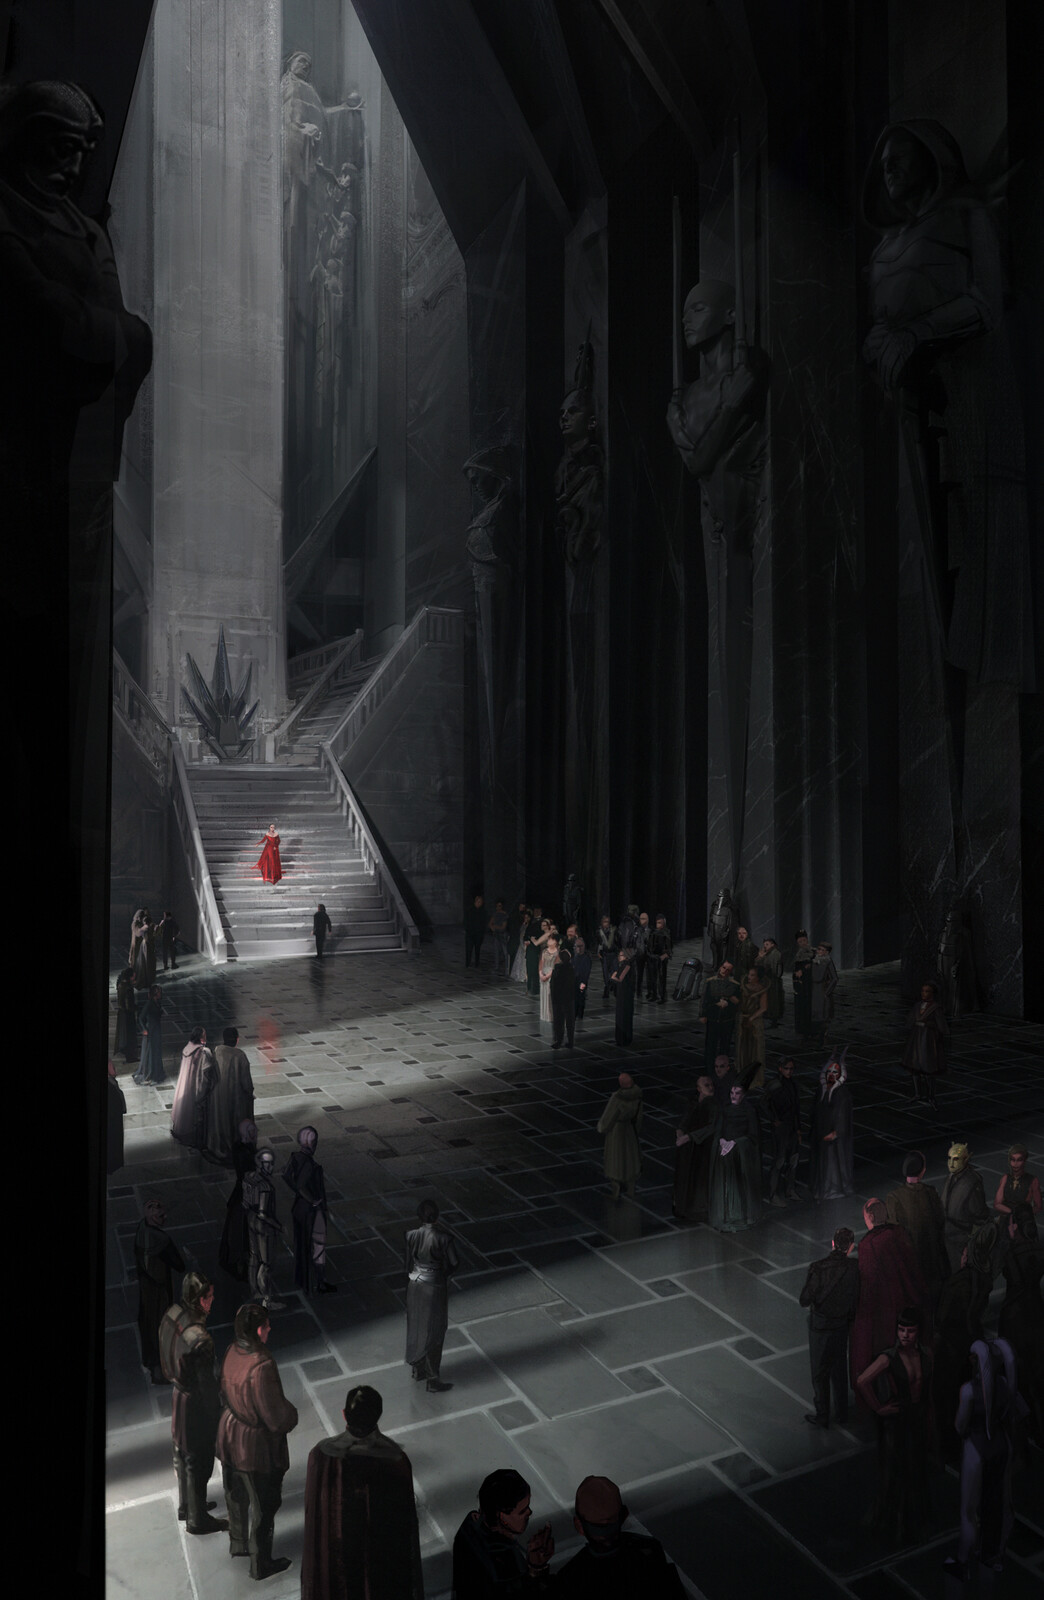 Sith Throne